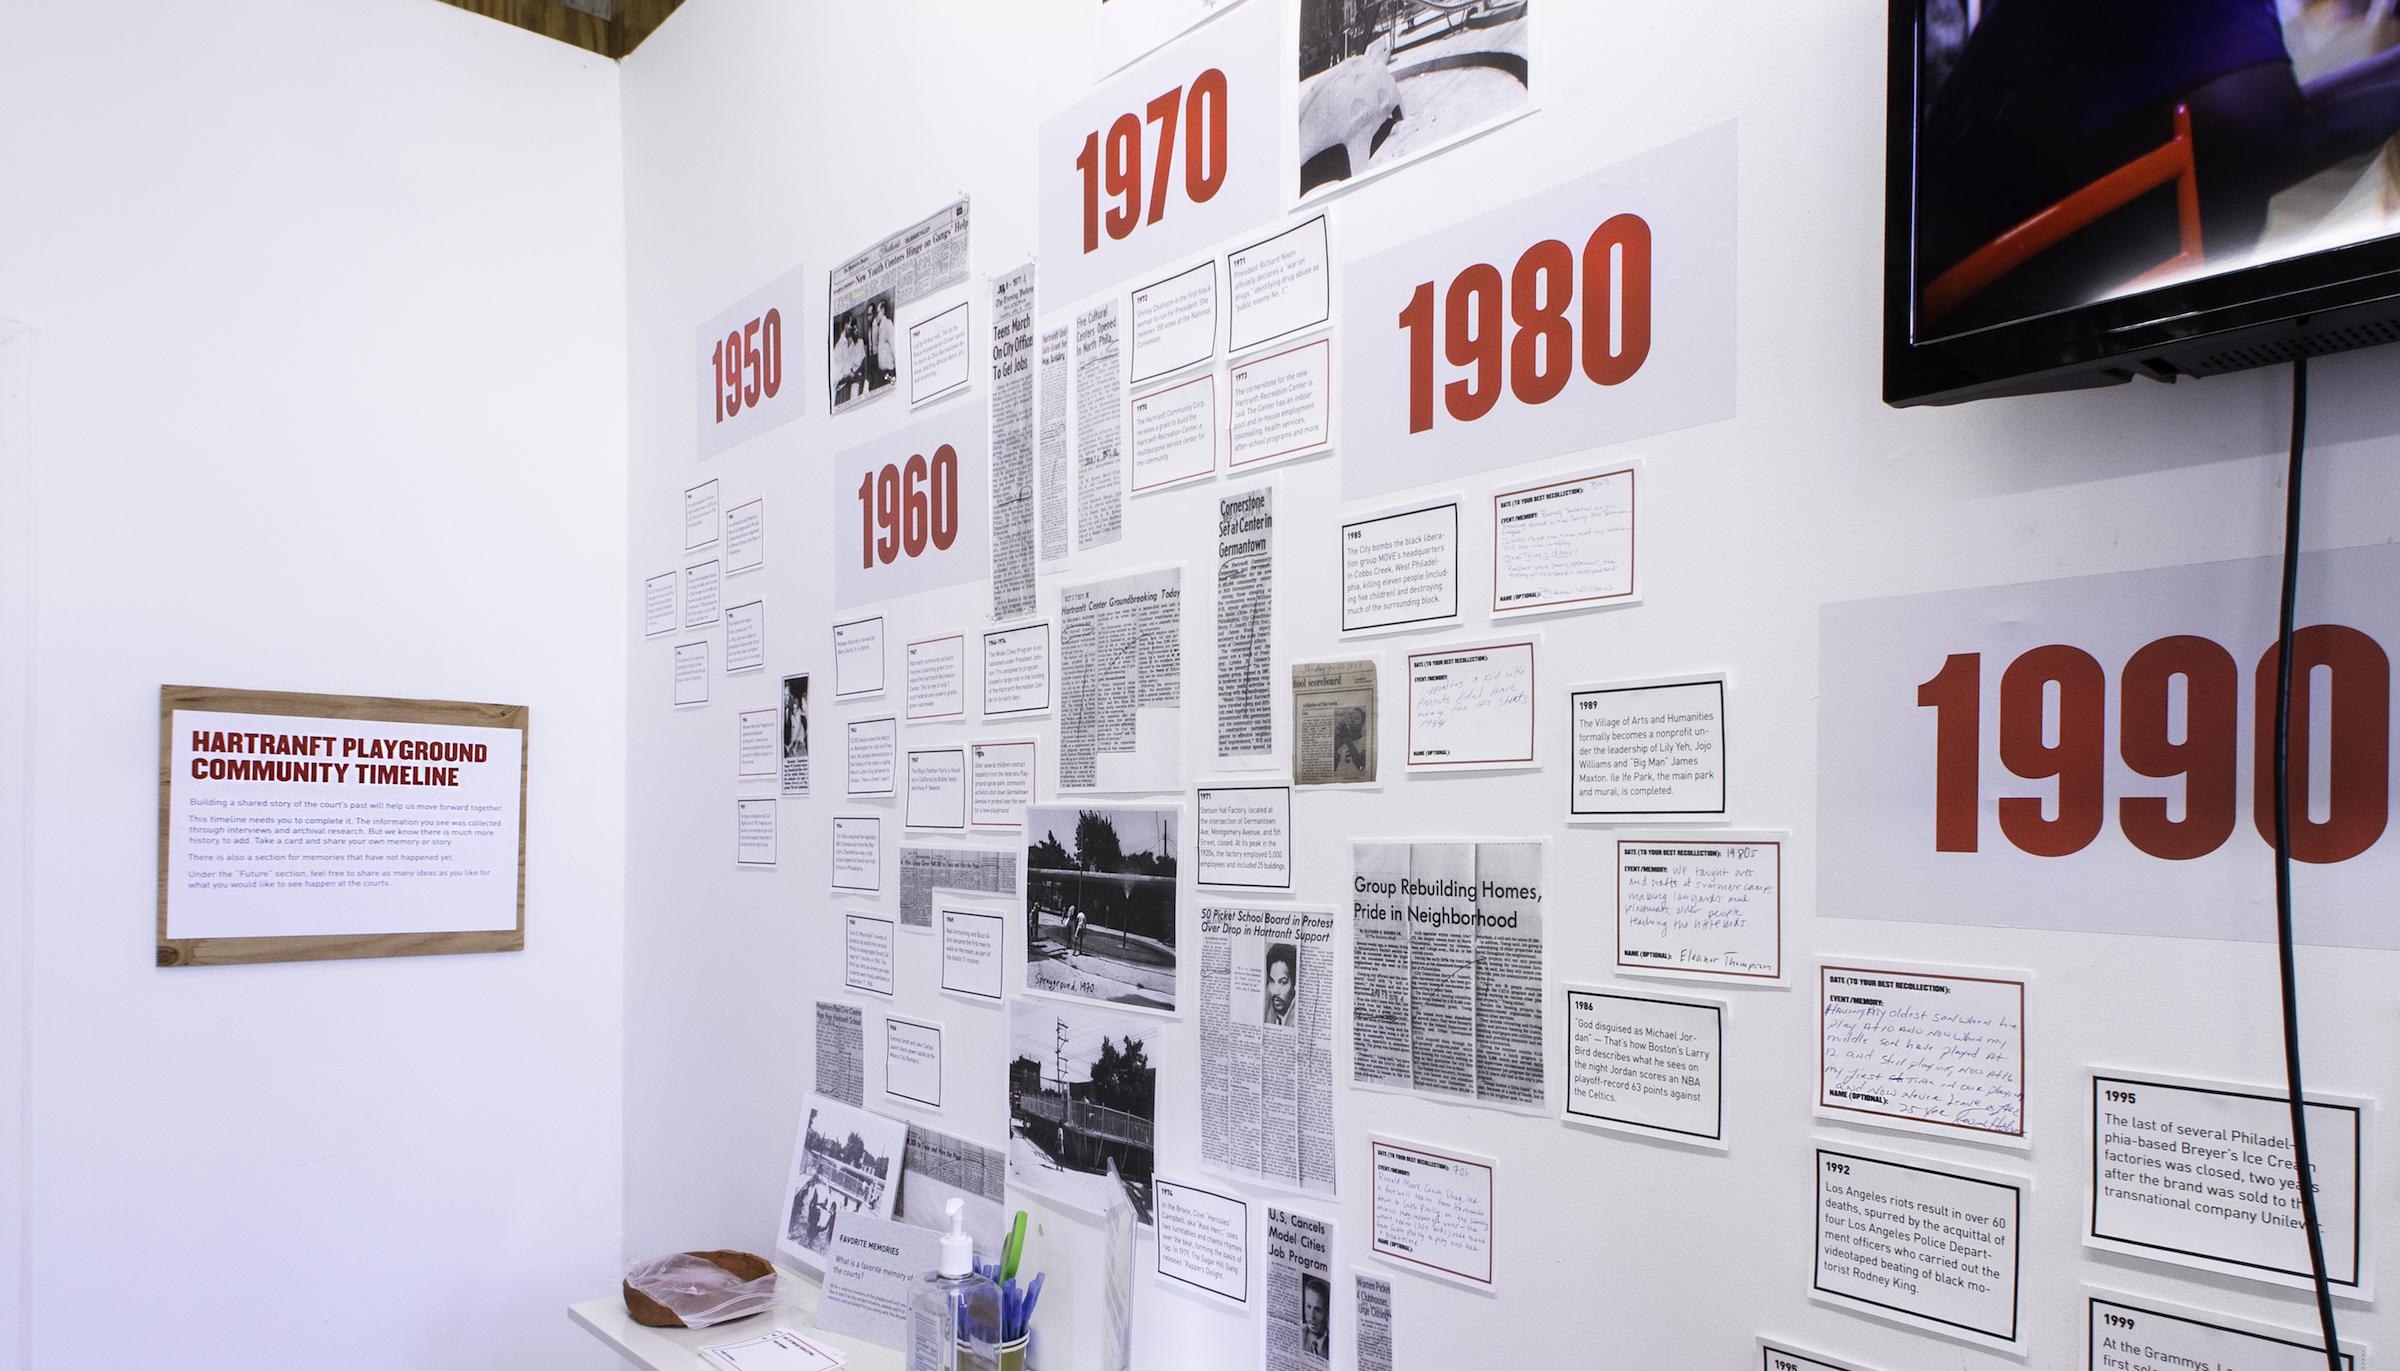 Hartranft Community Timeline half with placard